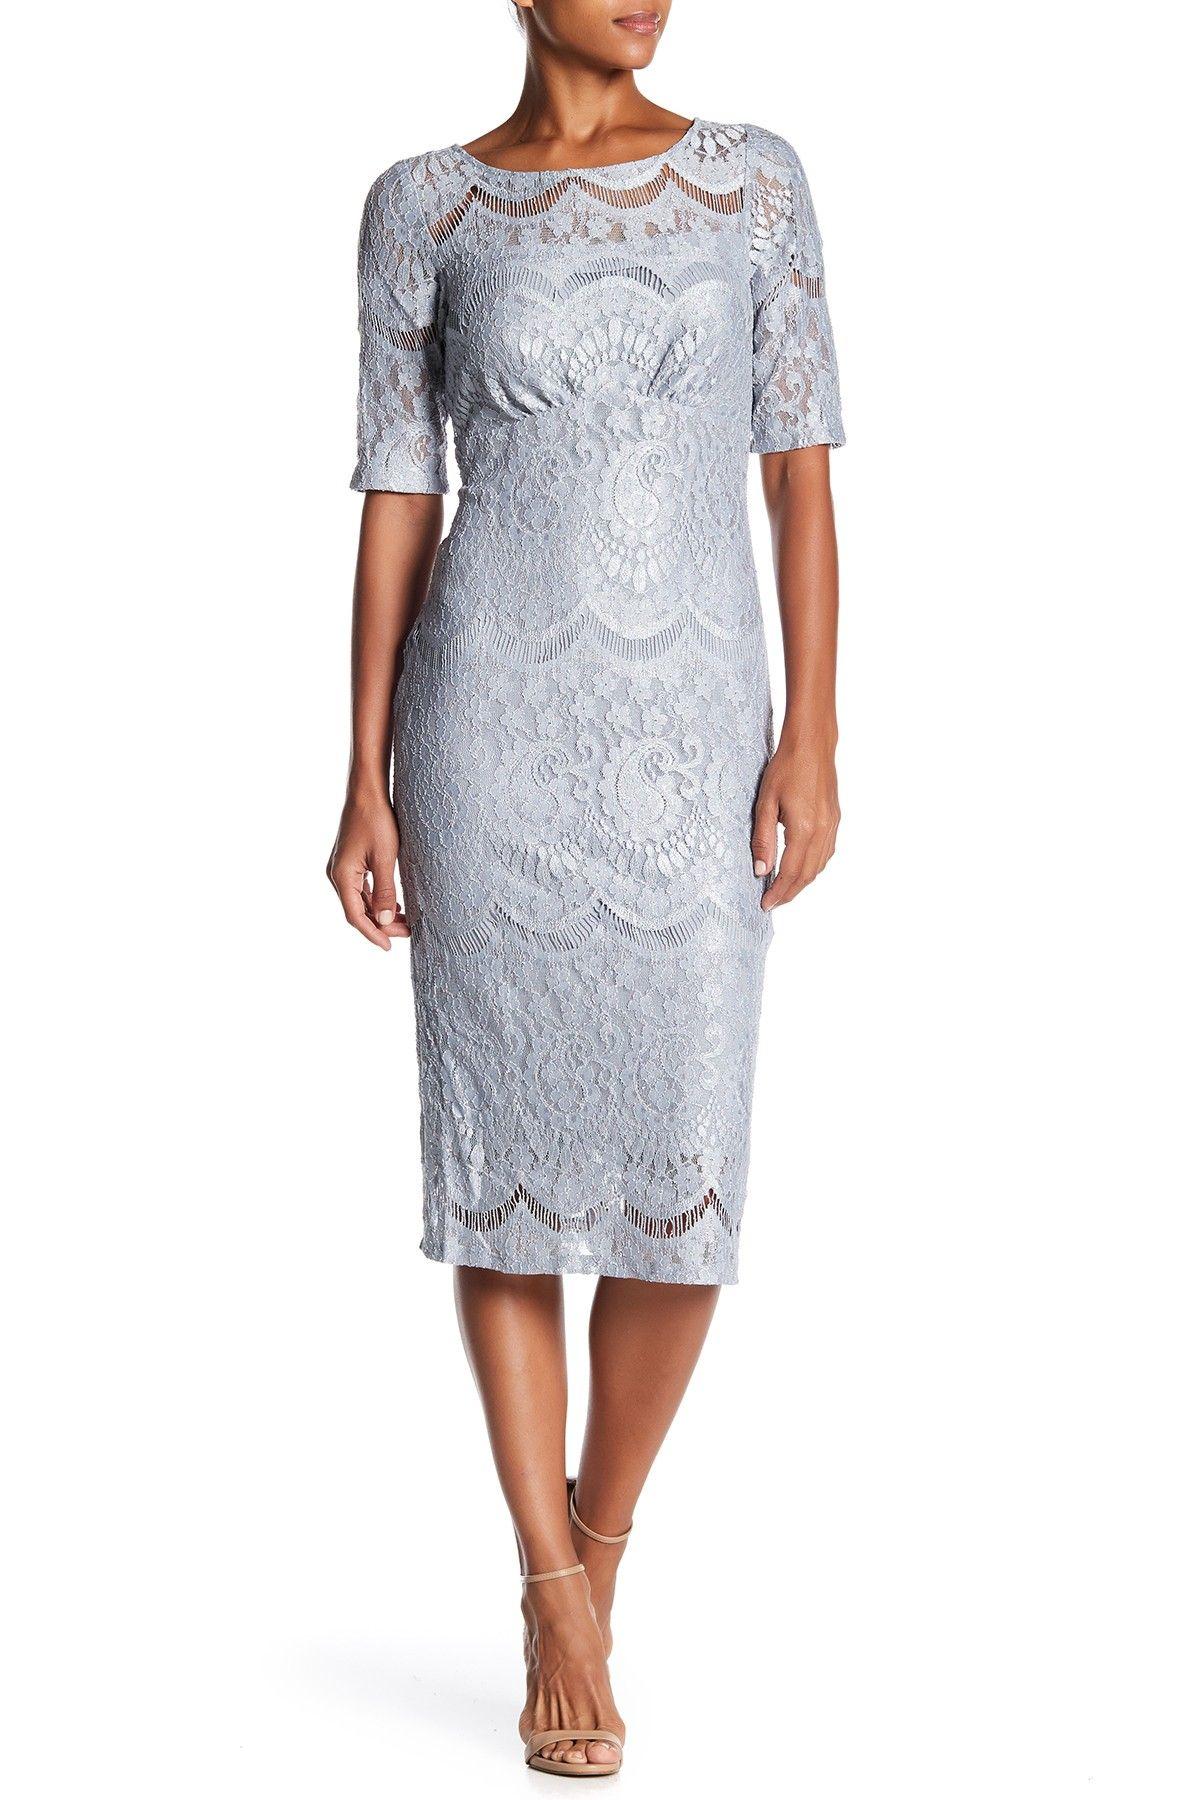 Rabbit Rabbit Rabbit   Metallic Foil Lace Dress   Lace dress